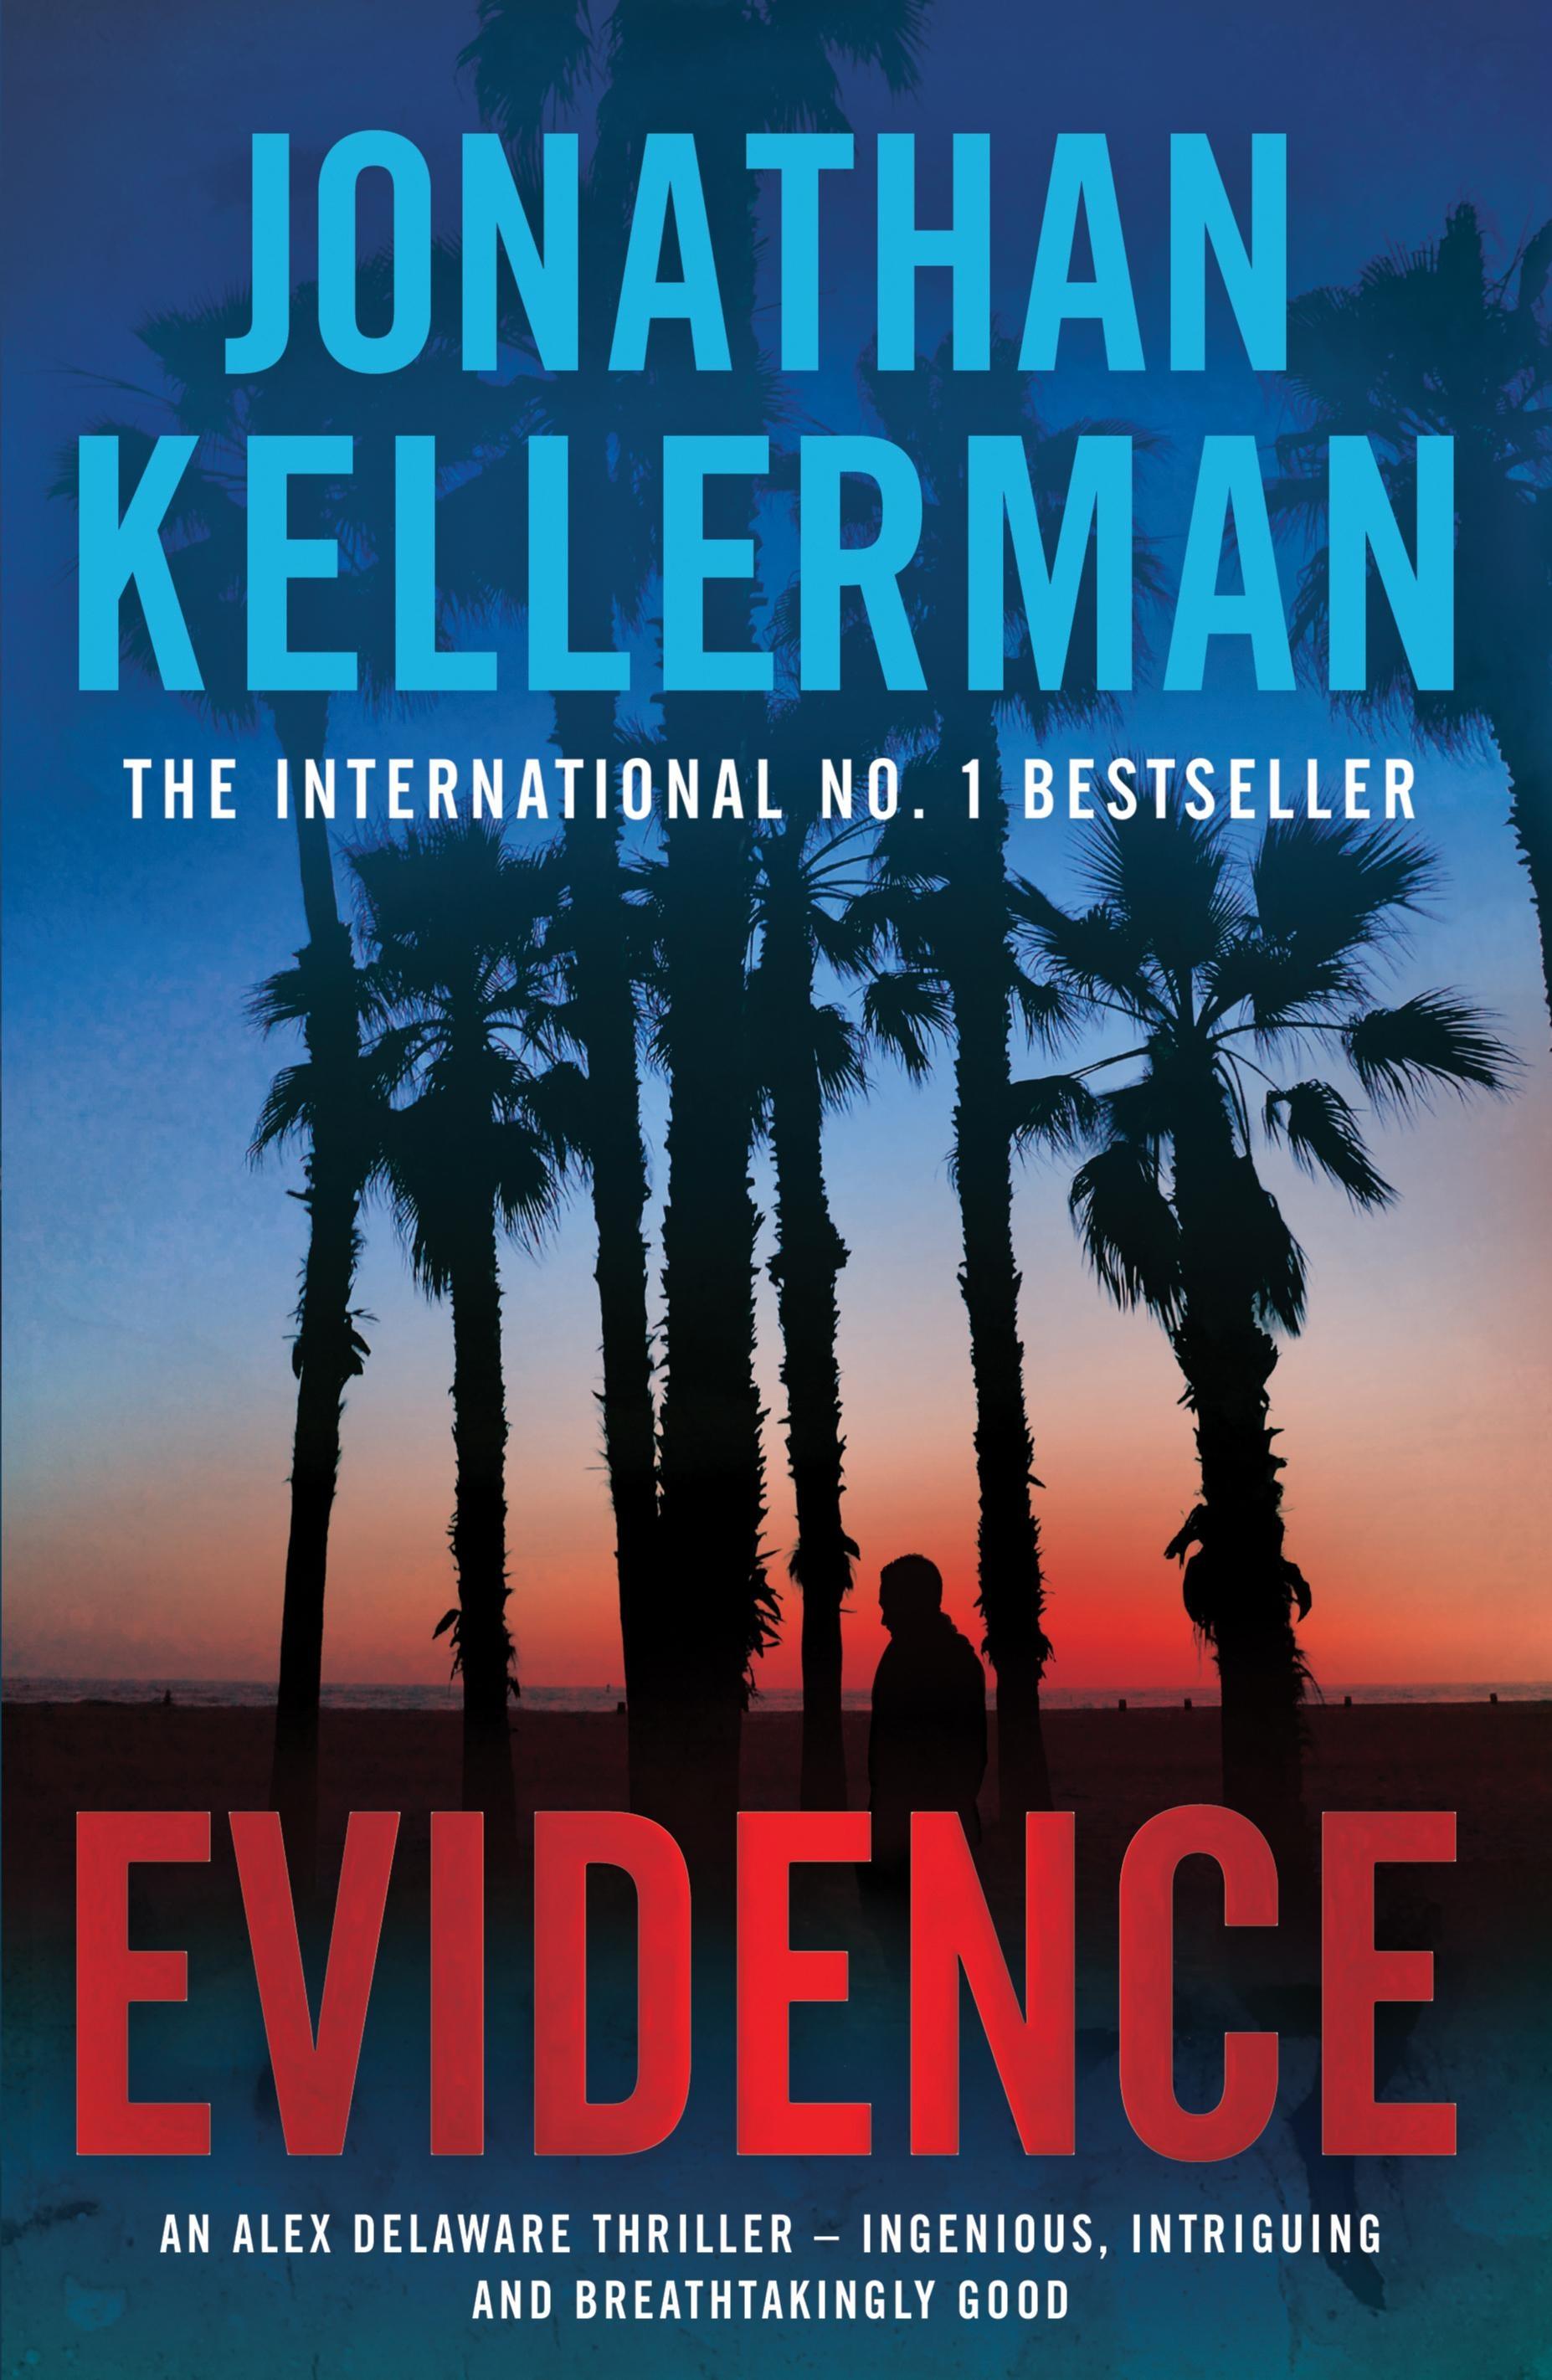 A masterful psychological thriller